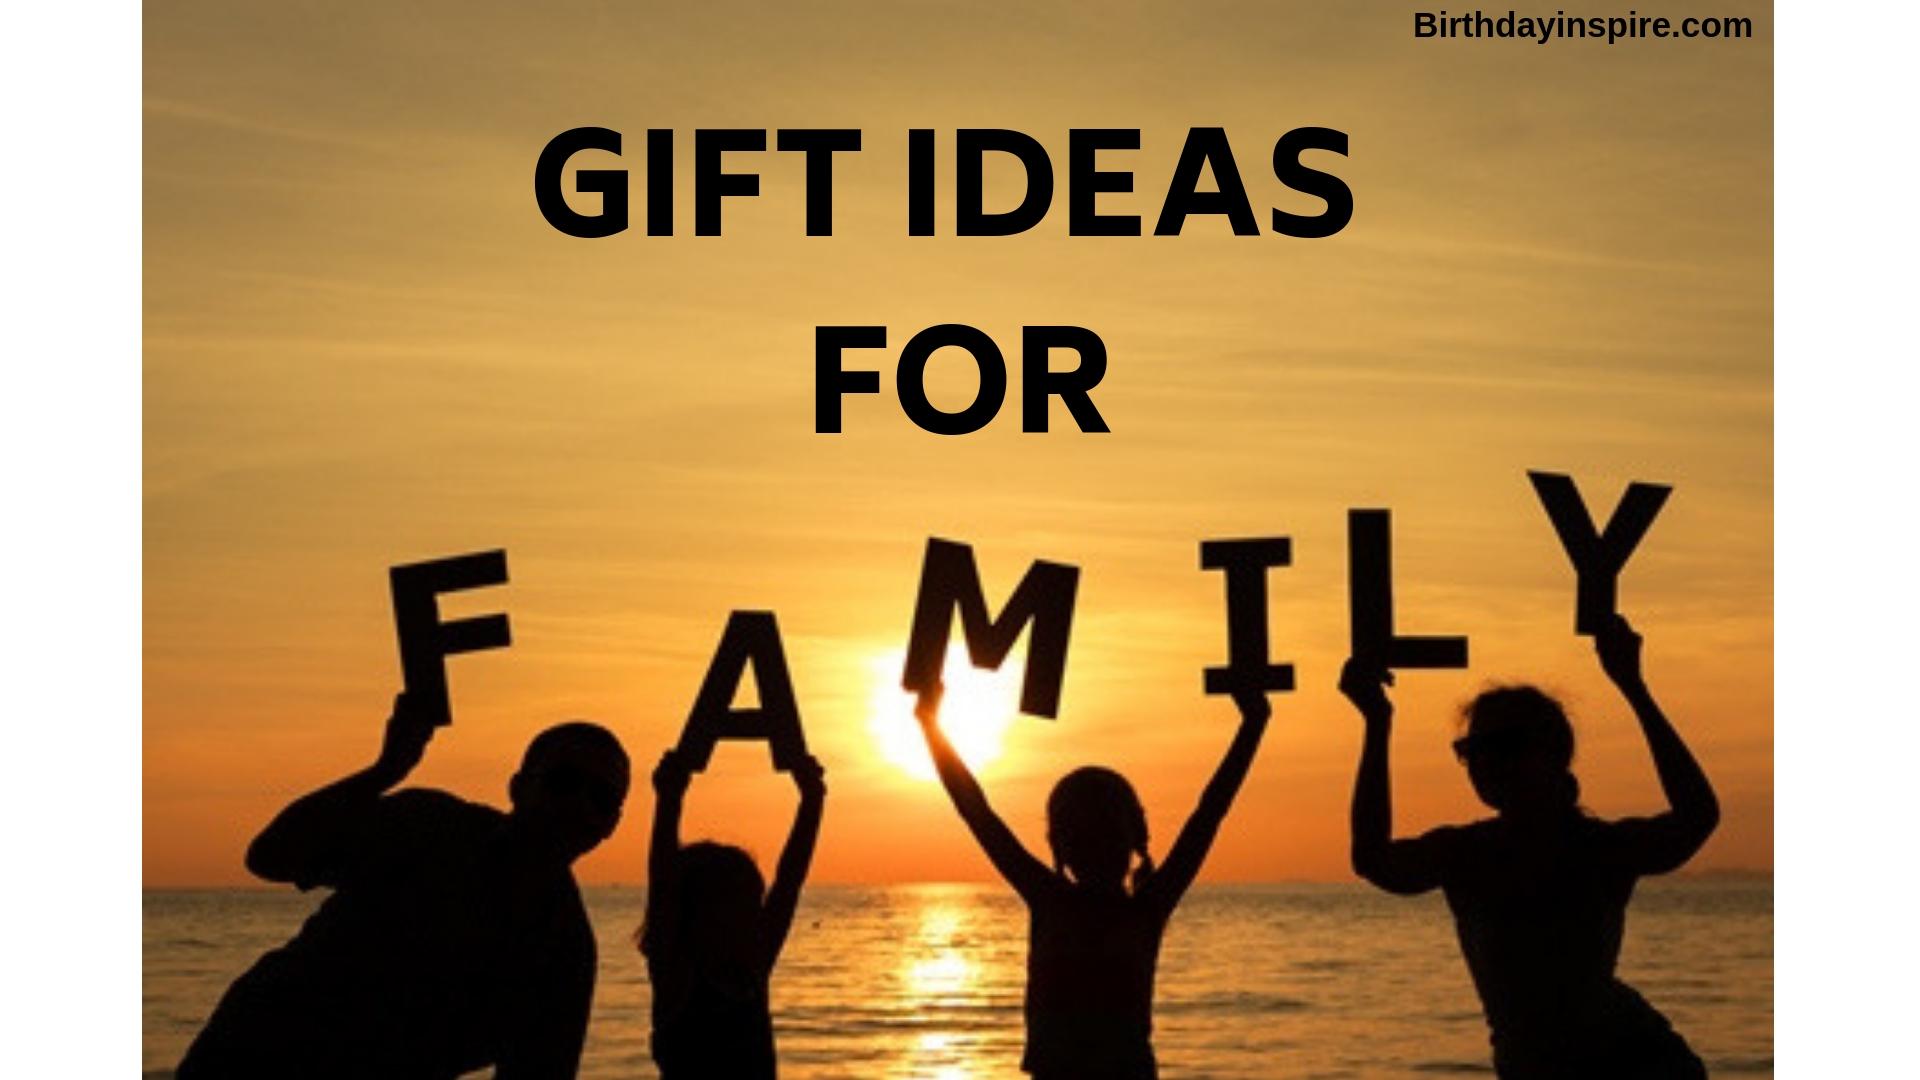 gift ideas for family